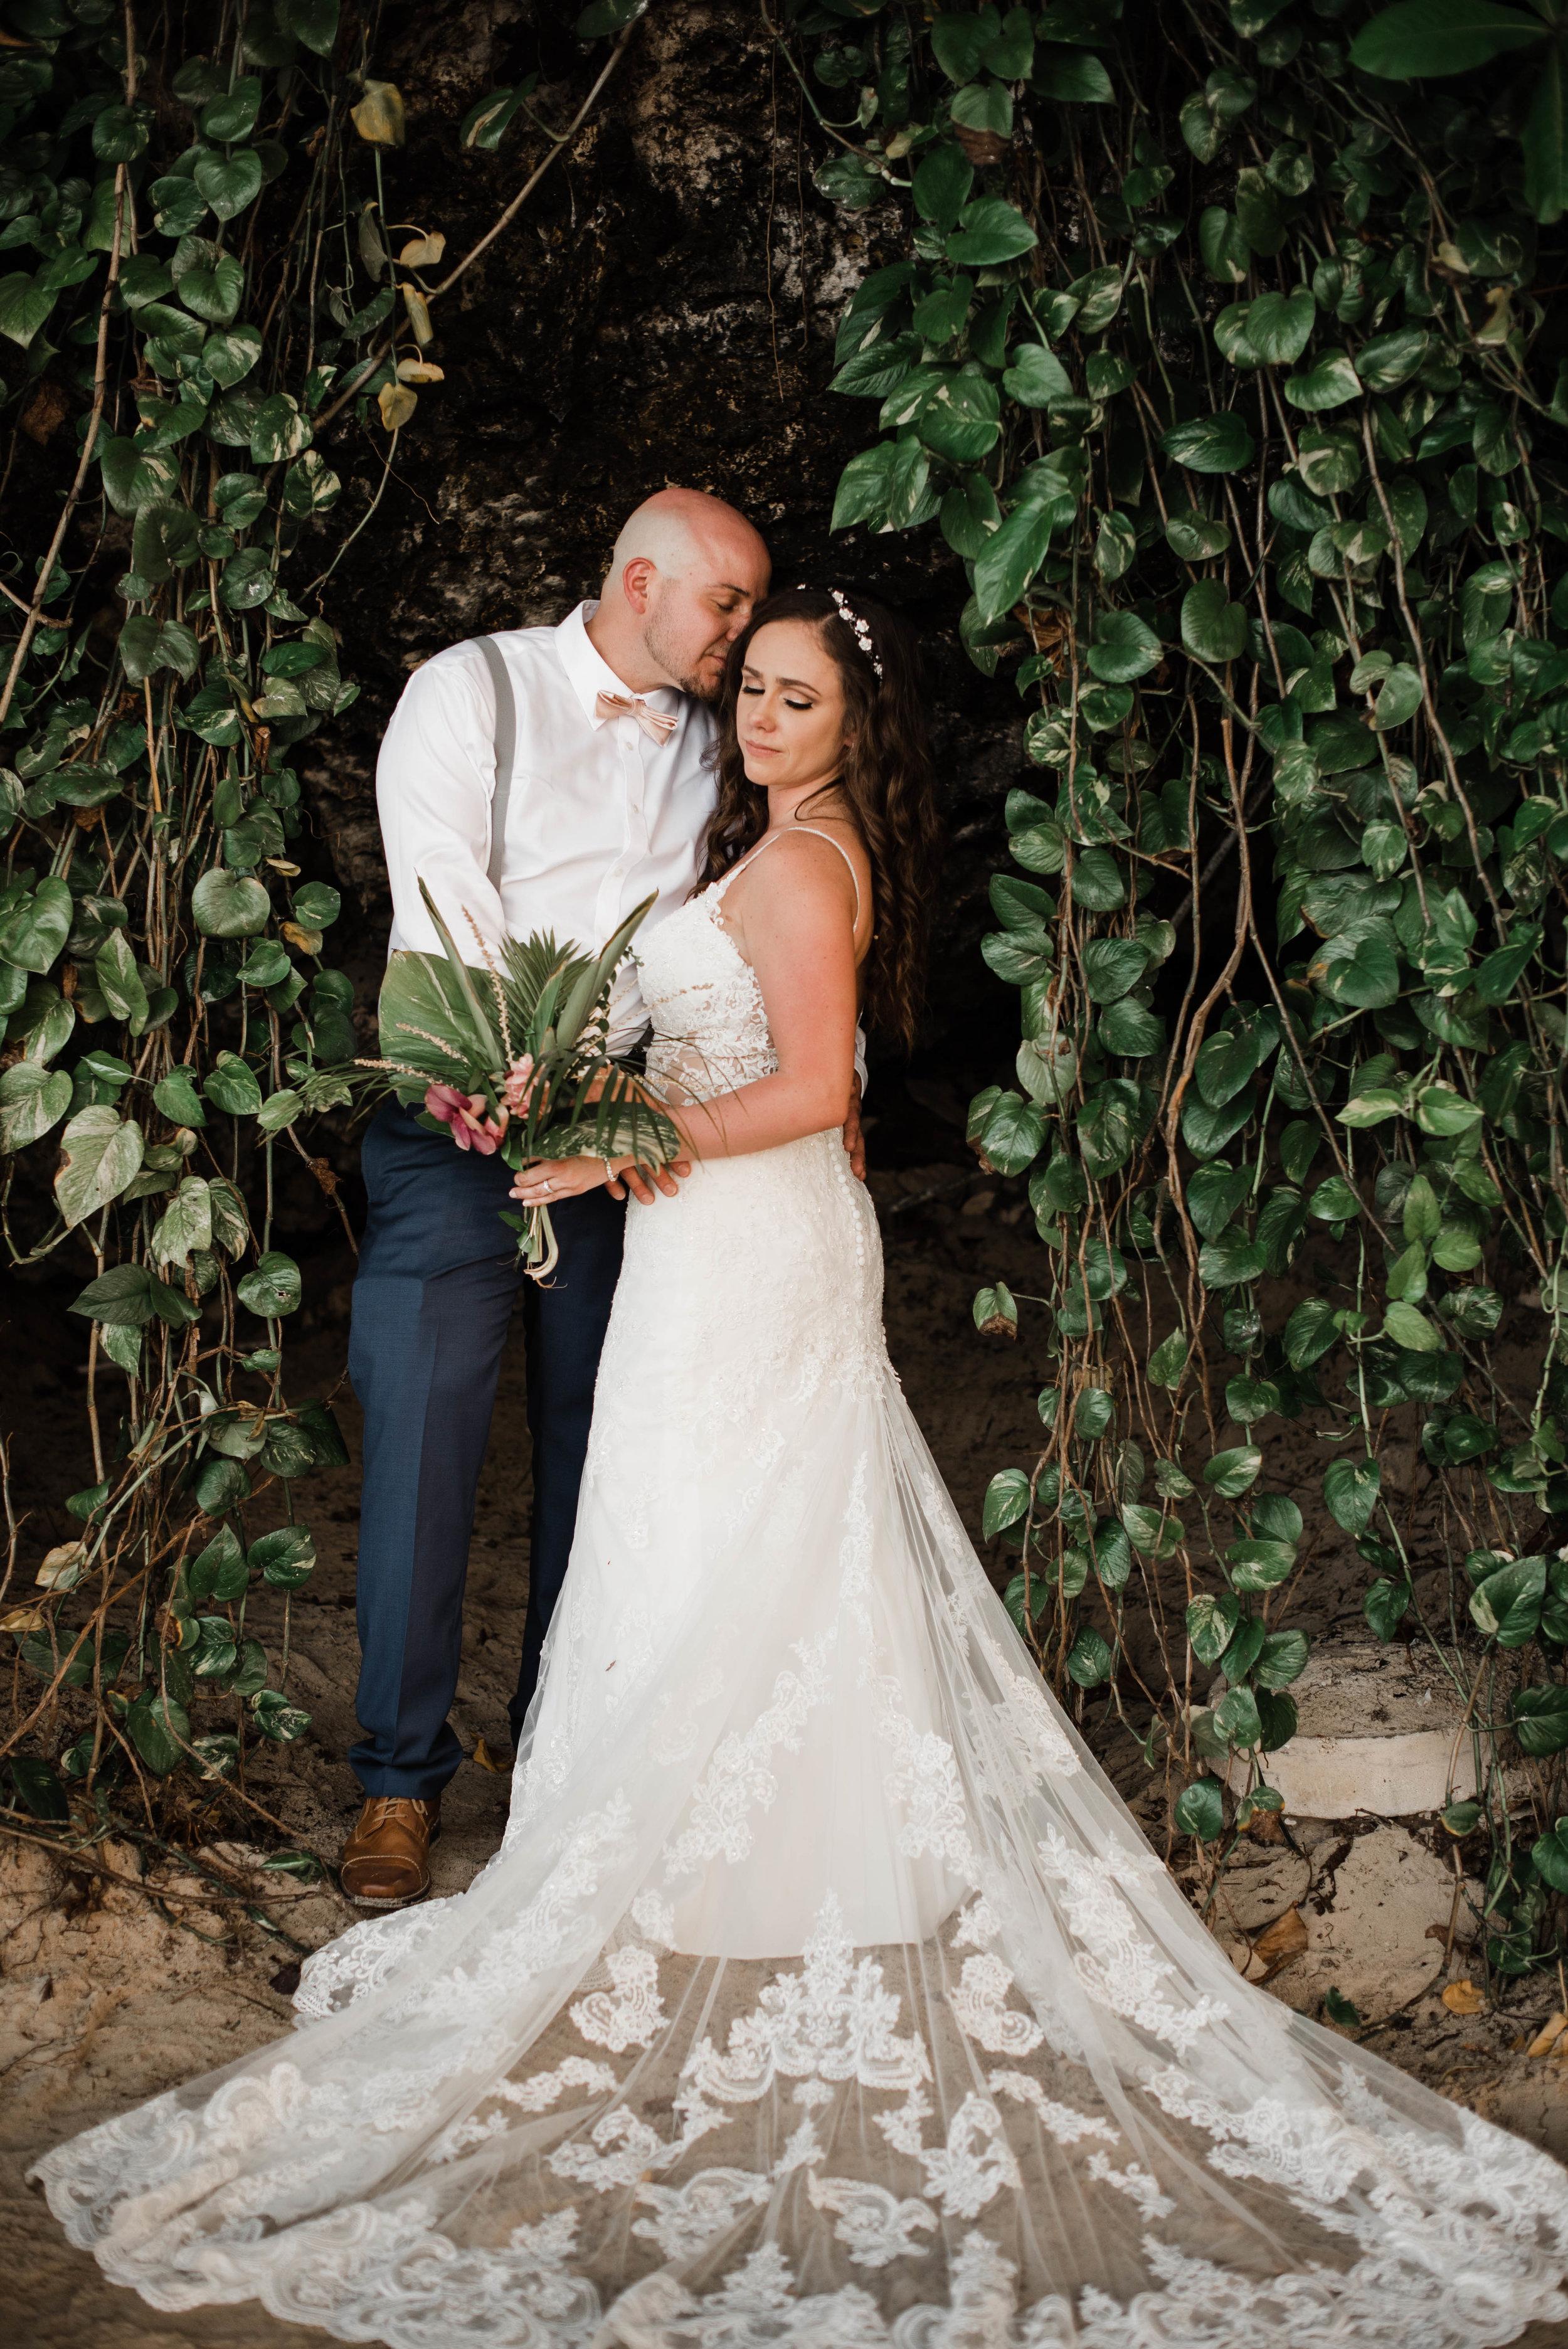 Southern-California-Wedding-Photography-Kalon-Weddings-10.jpg